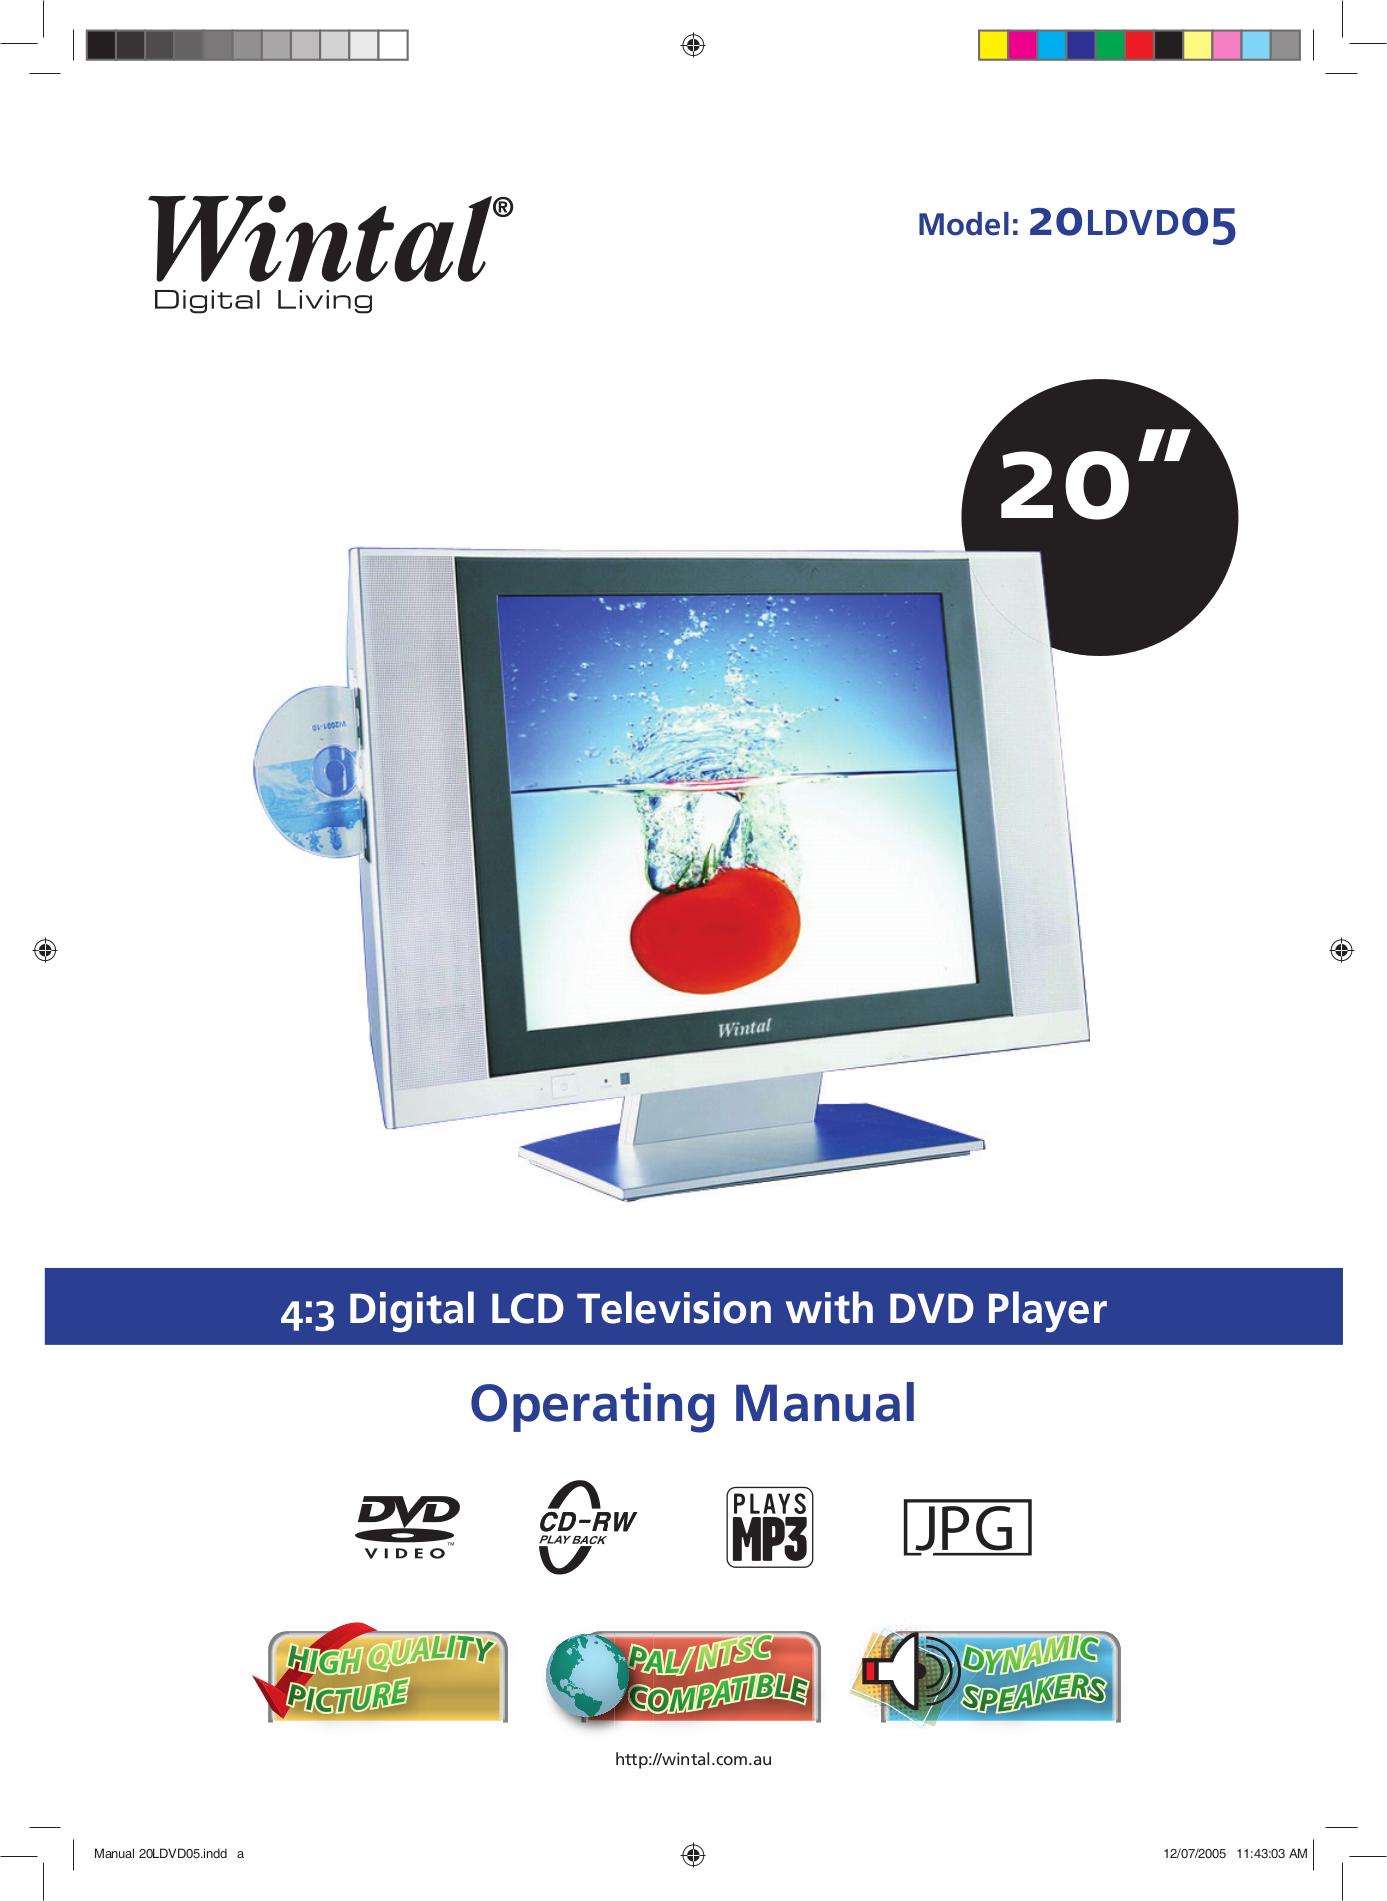 pdf for Wintal TV 20LDVD05 manual